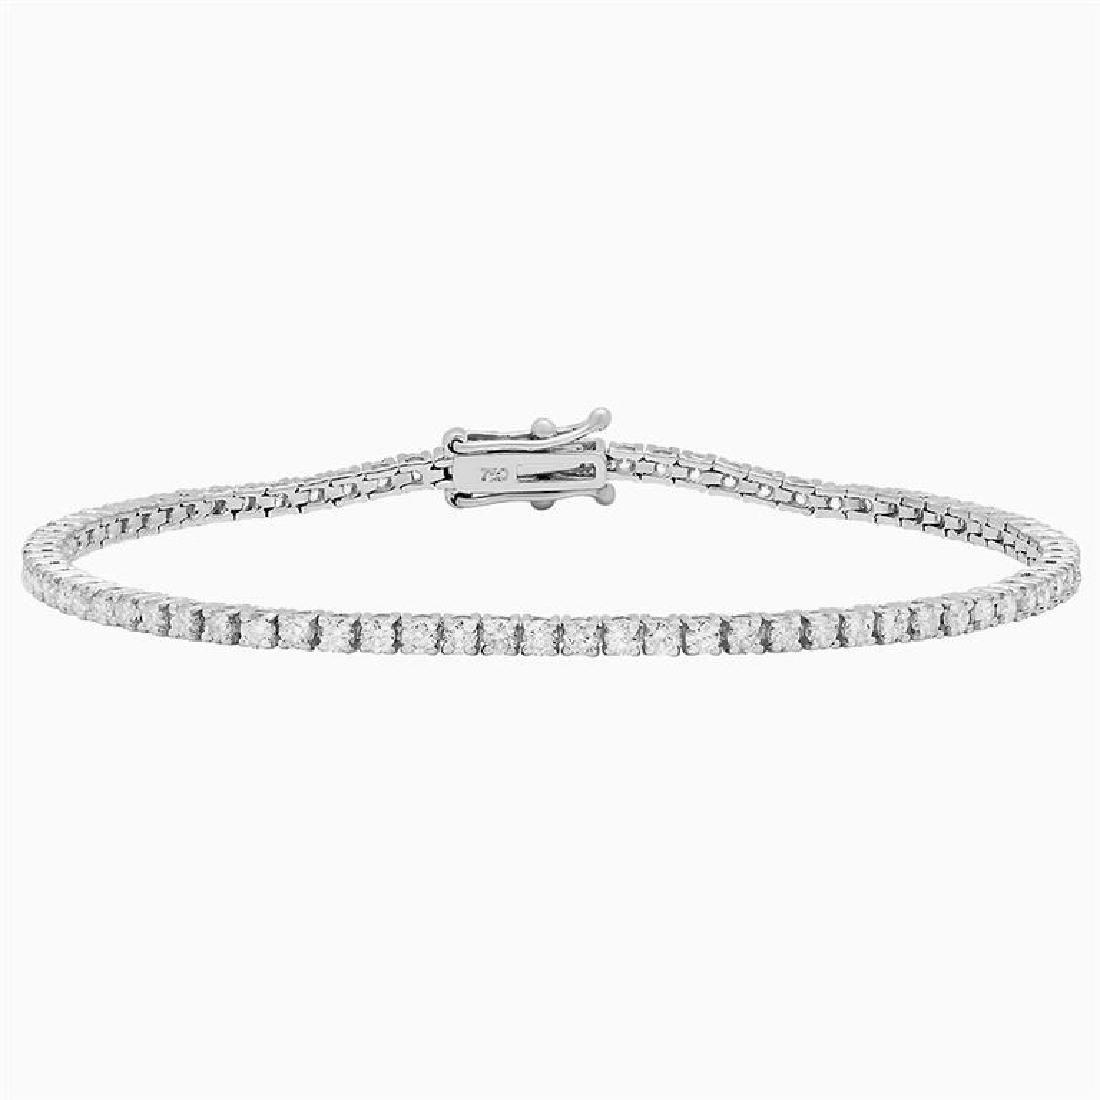 18k White Gold 2.76ct Diamond Tennis Bracelet